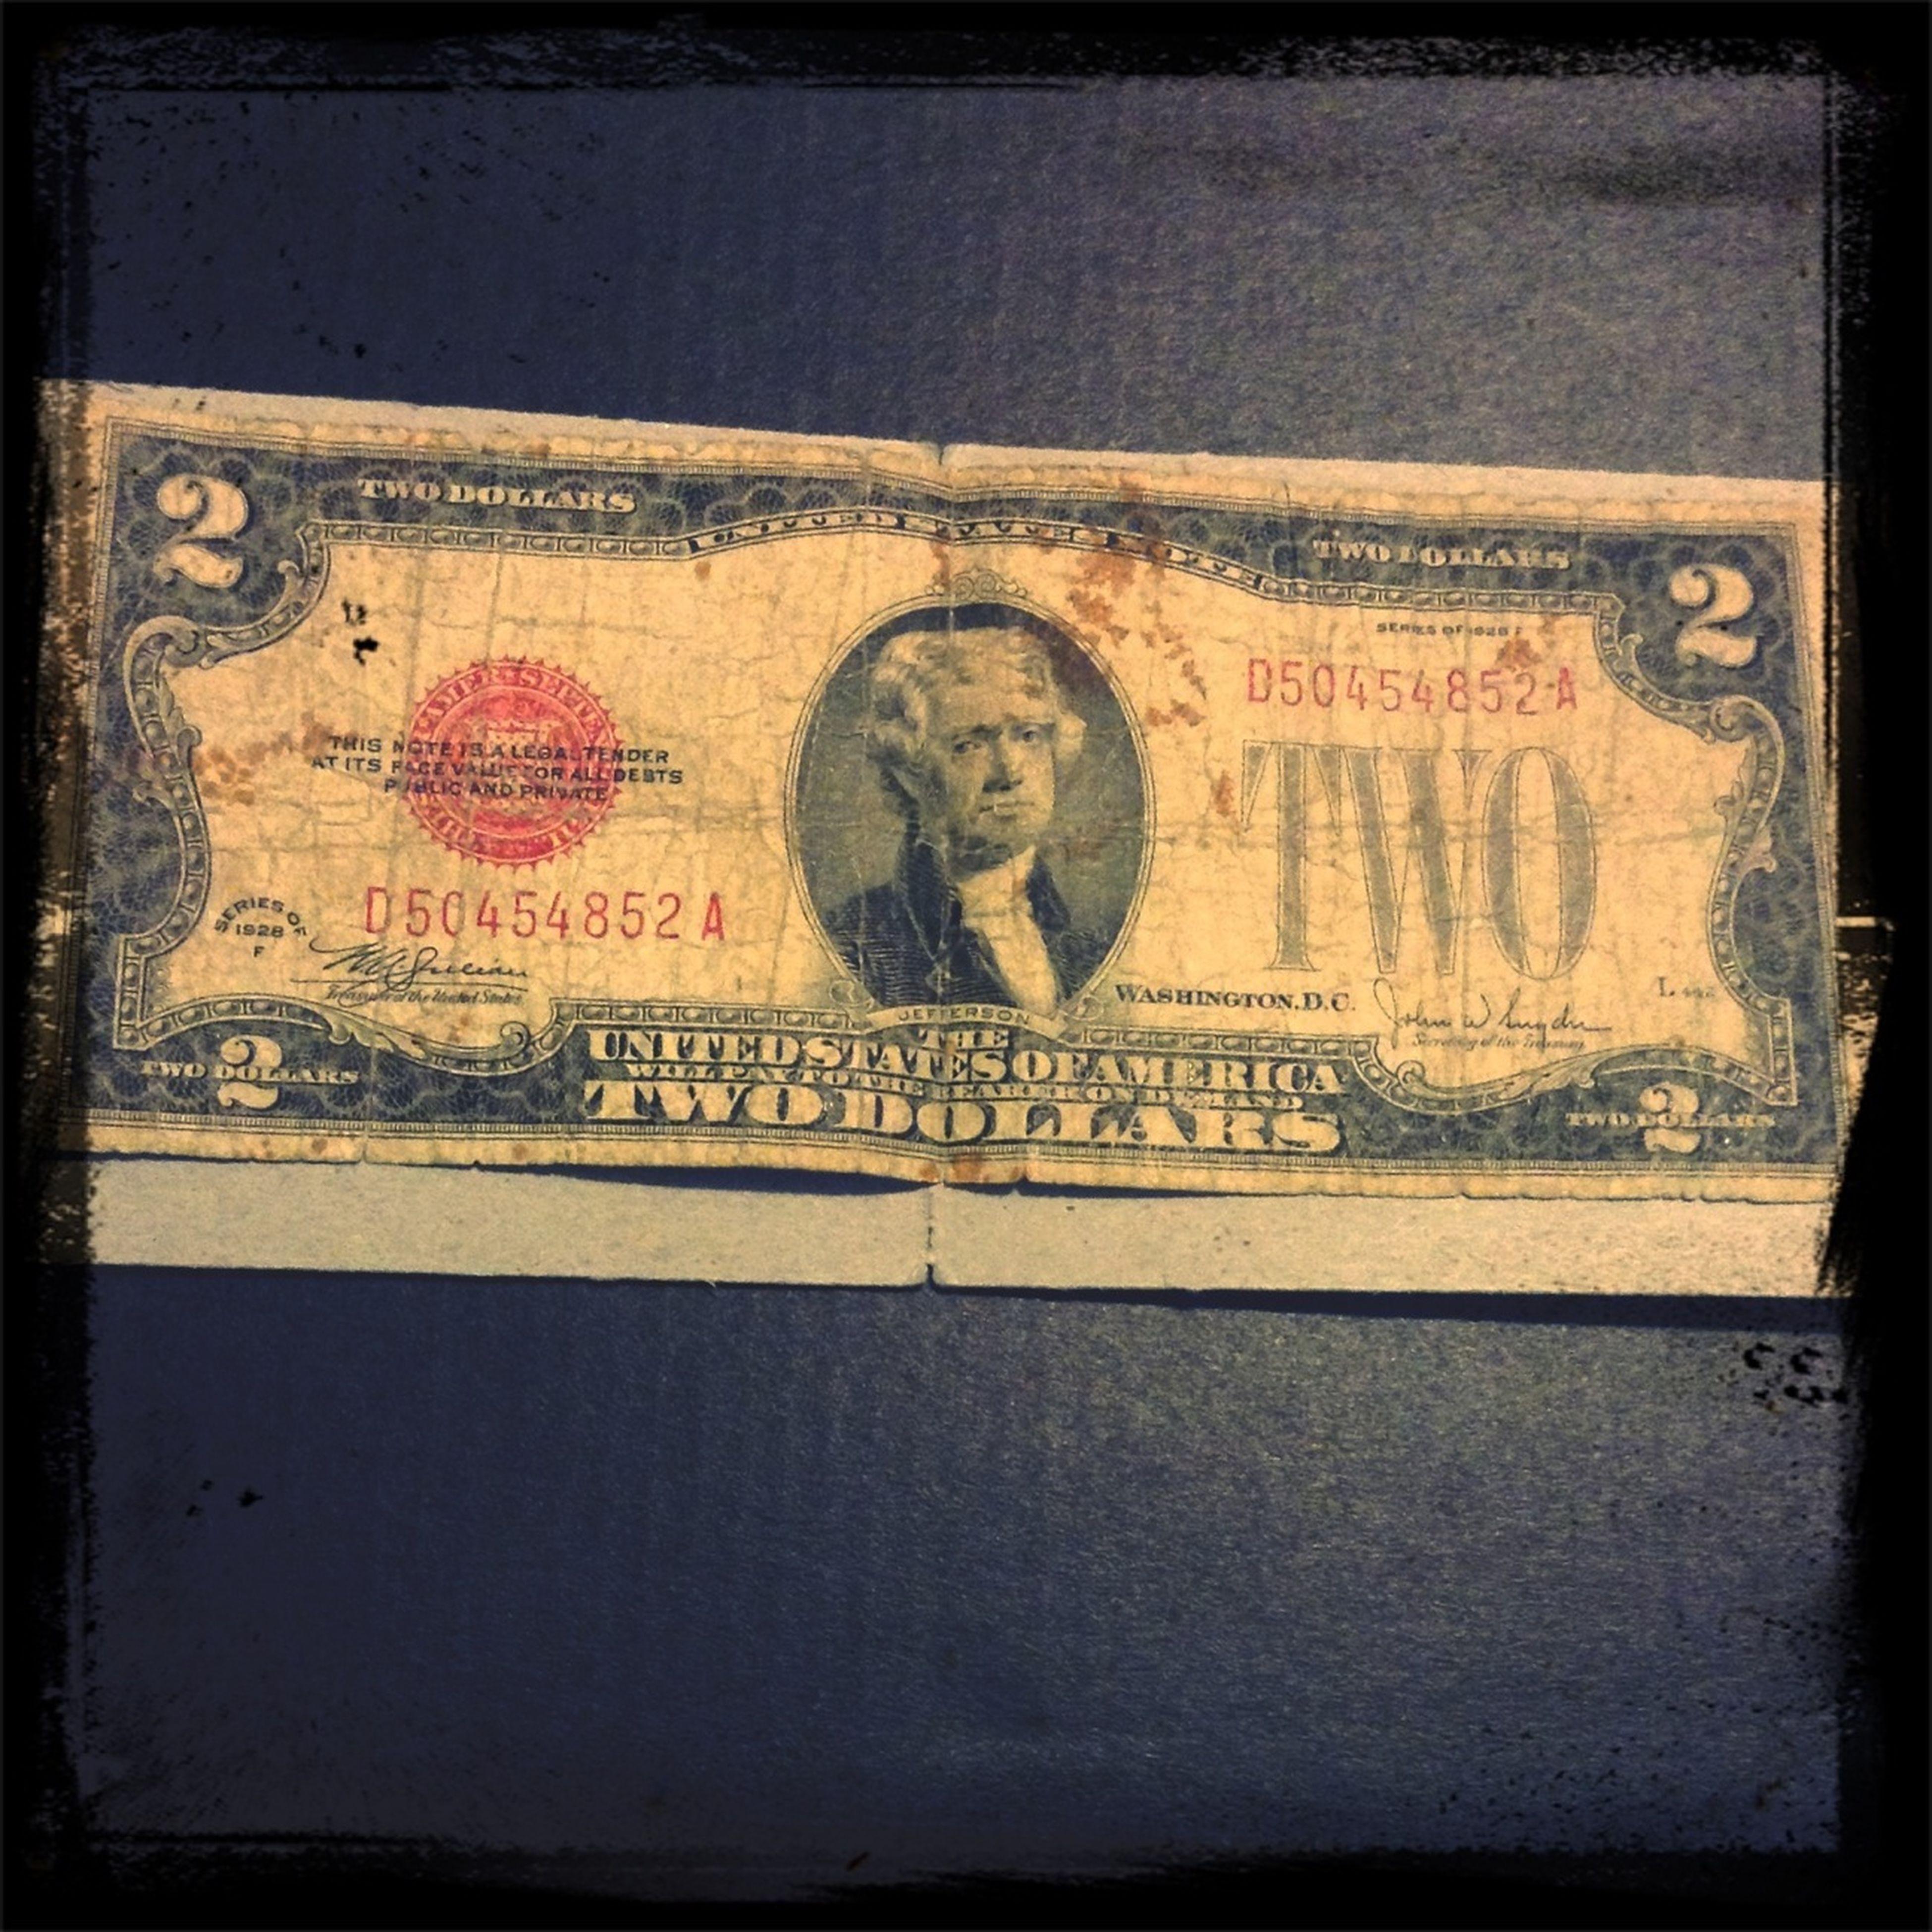 My very old lucky $2 Bill Strange Possessions